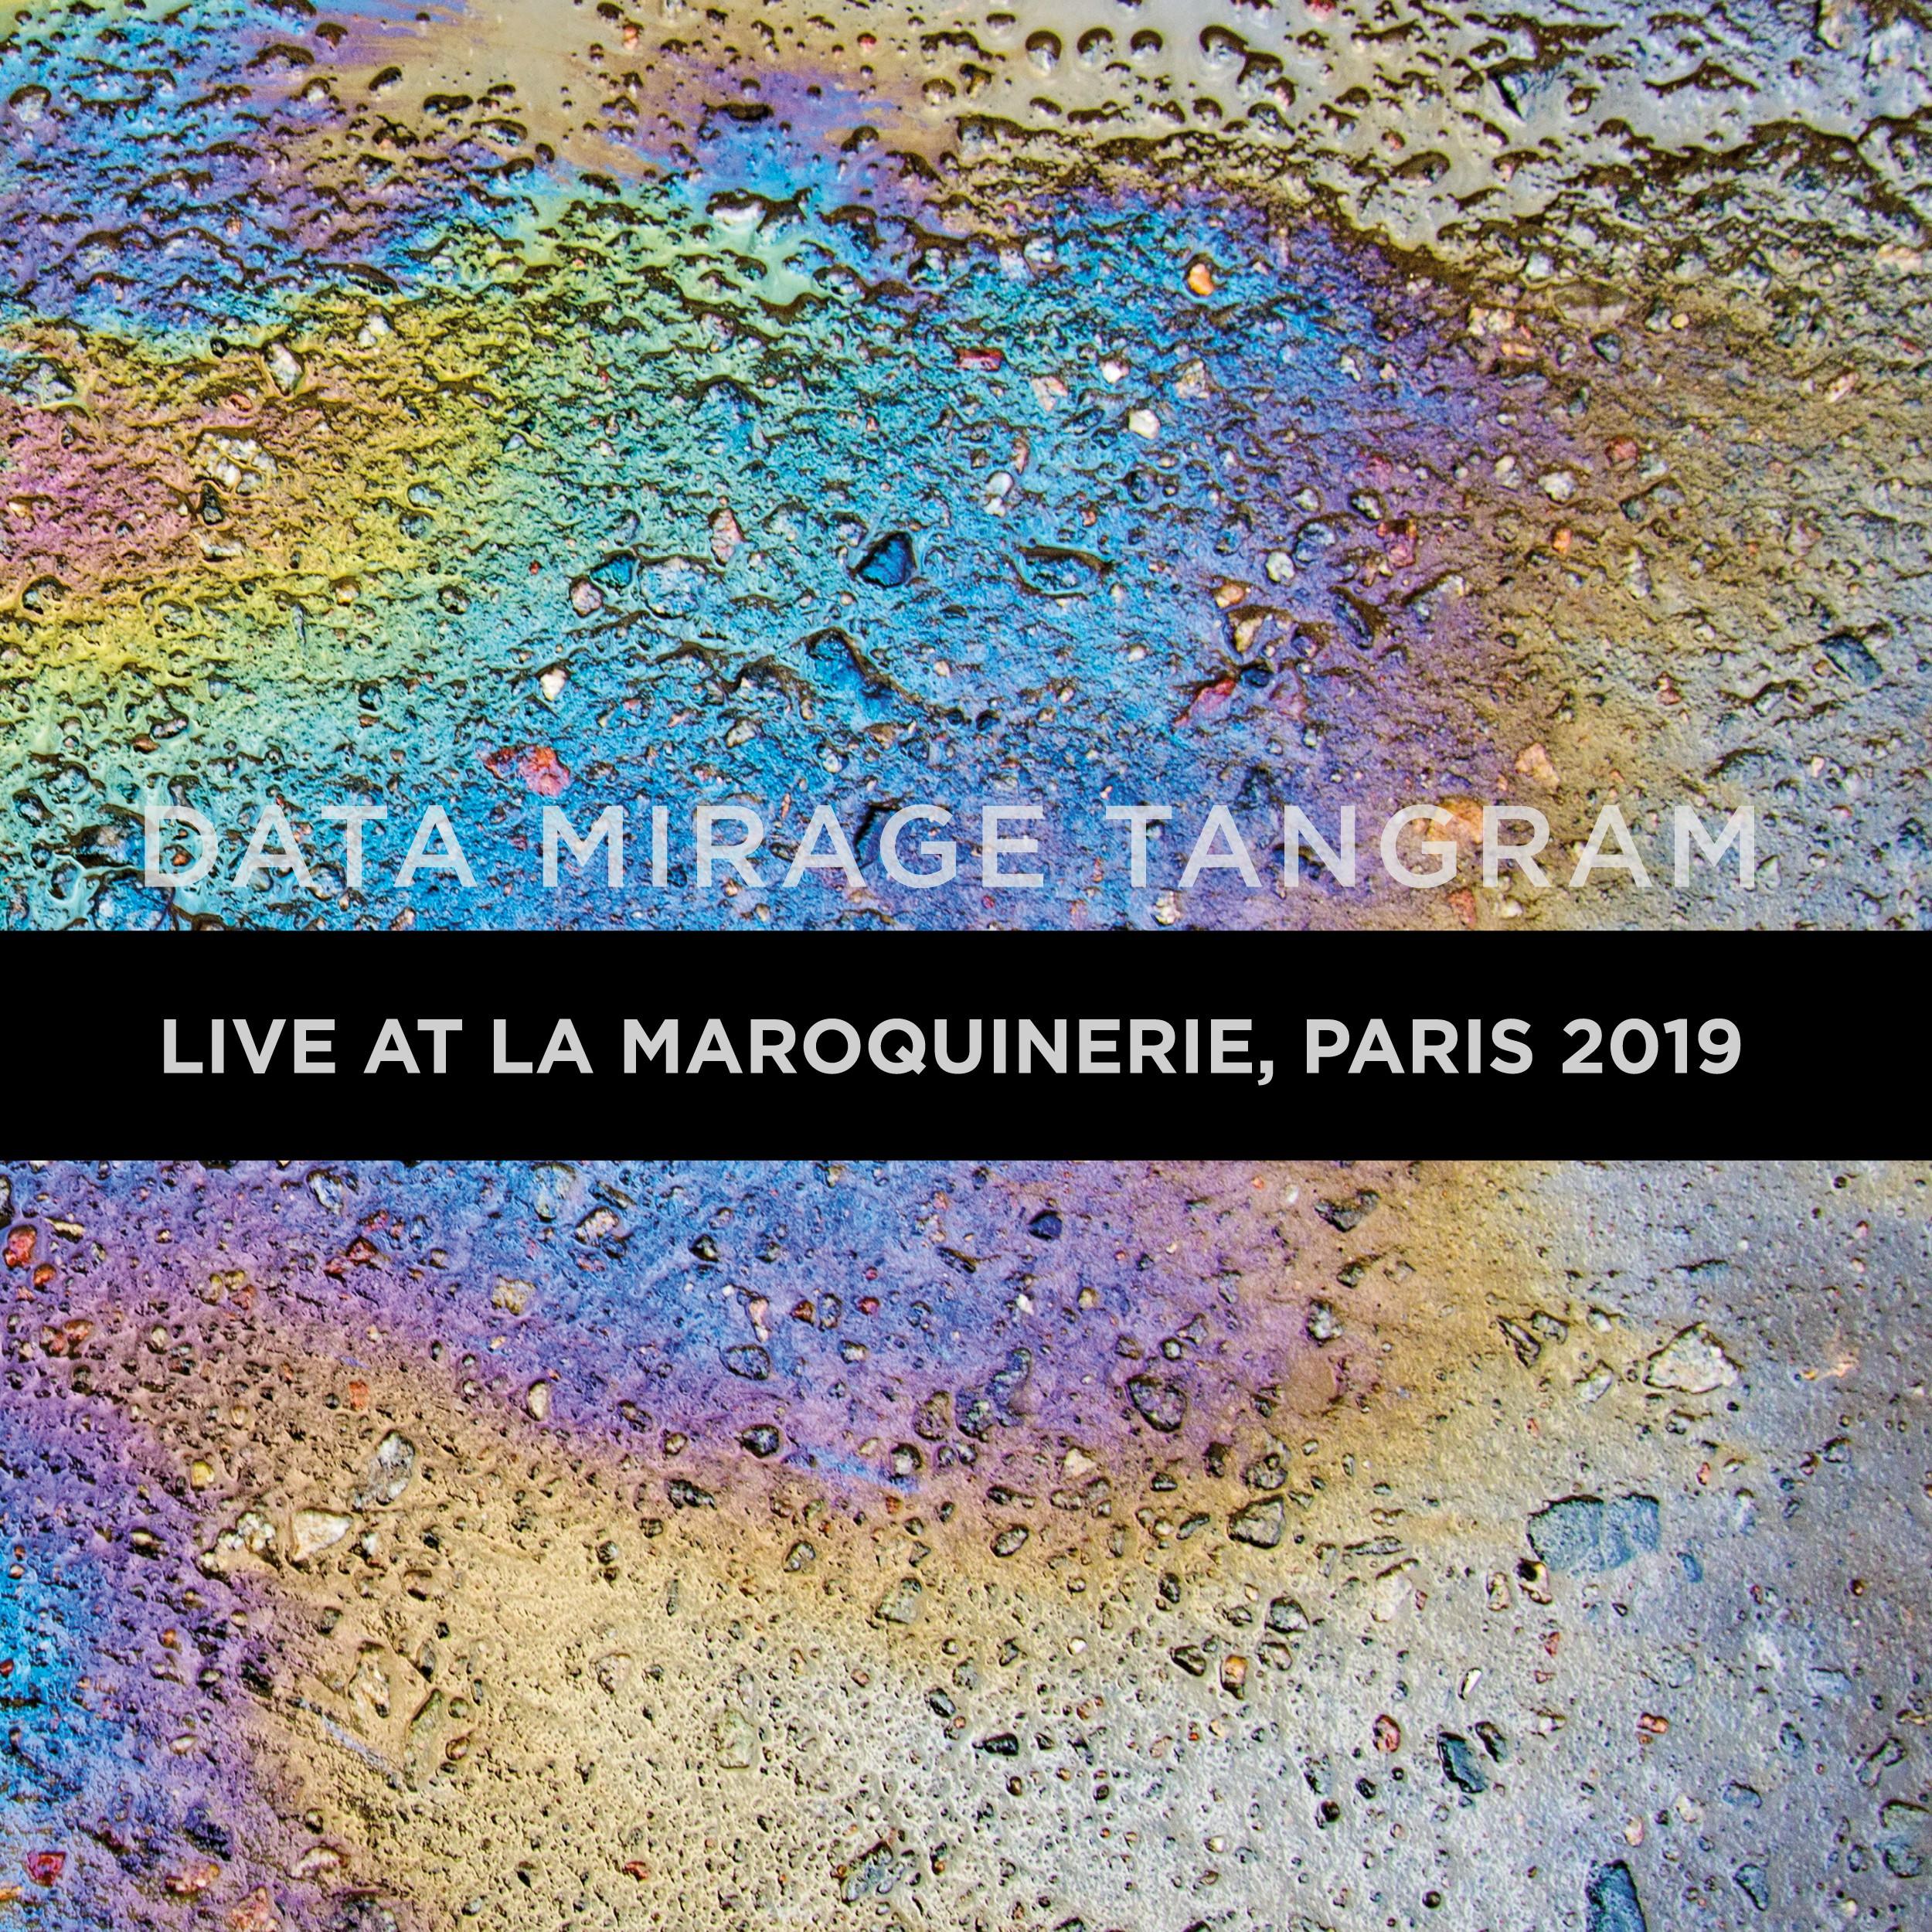 THE YOUNG GODS – Live At La Maroquinerie, Paris 2019